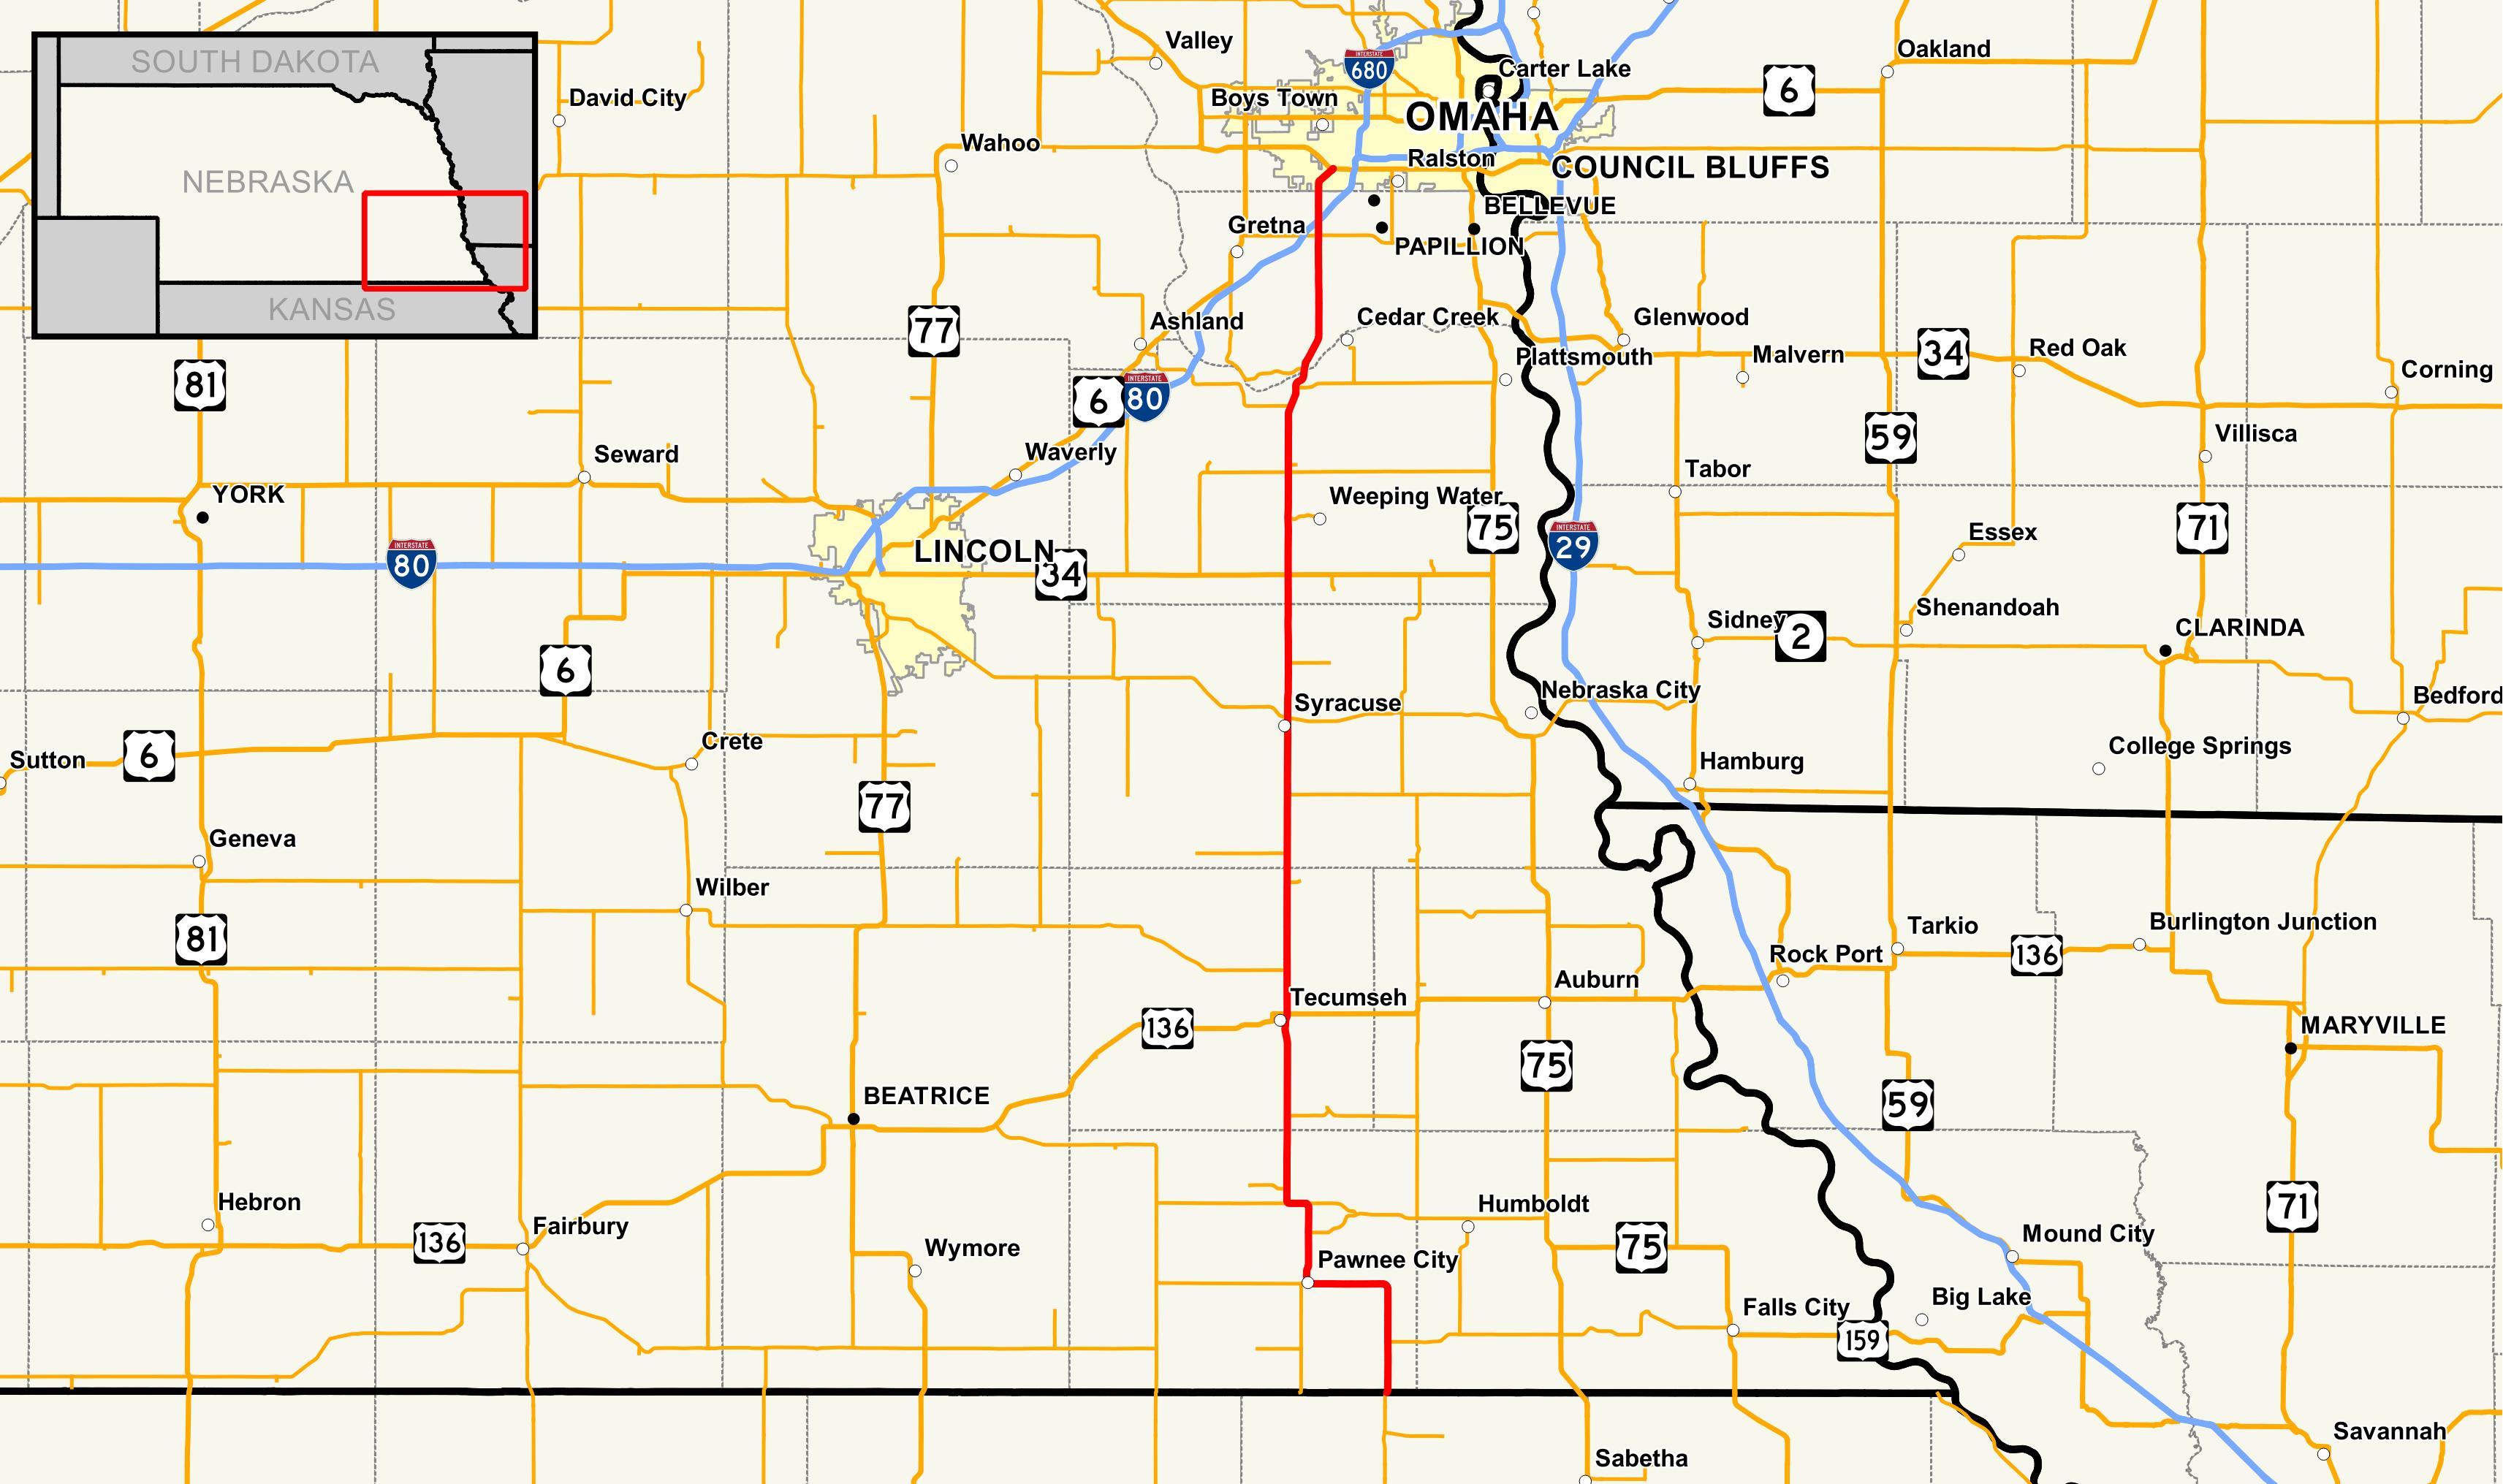 nebraska highway 50 - wikipedia